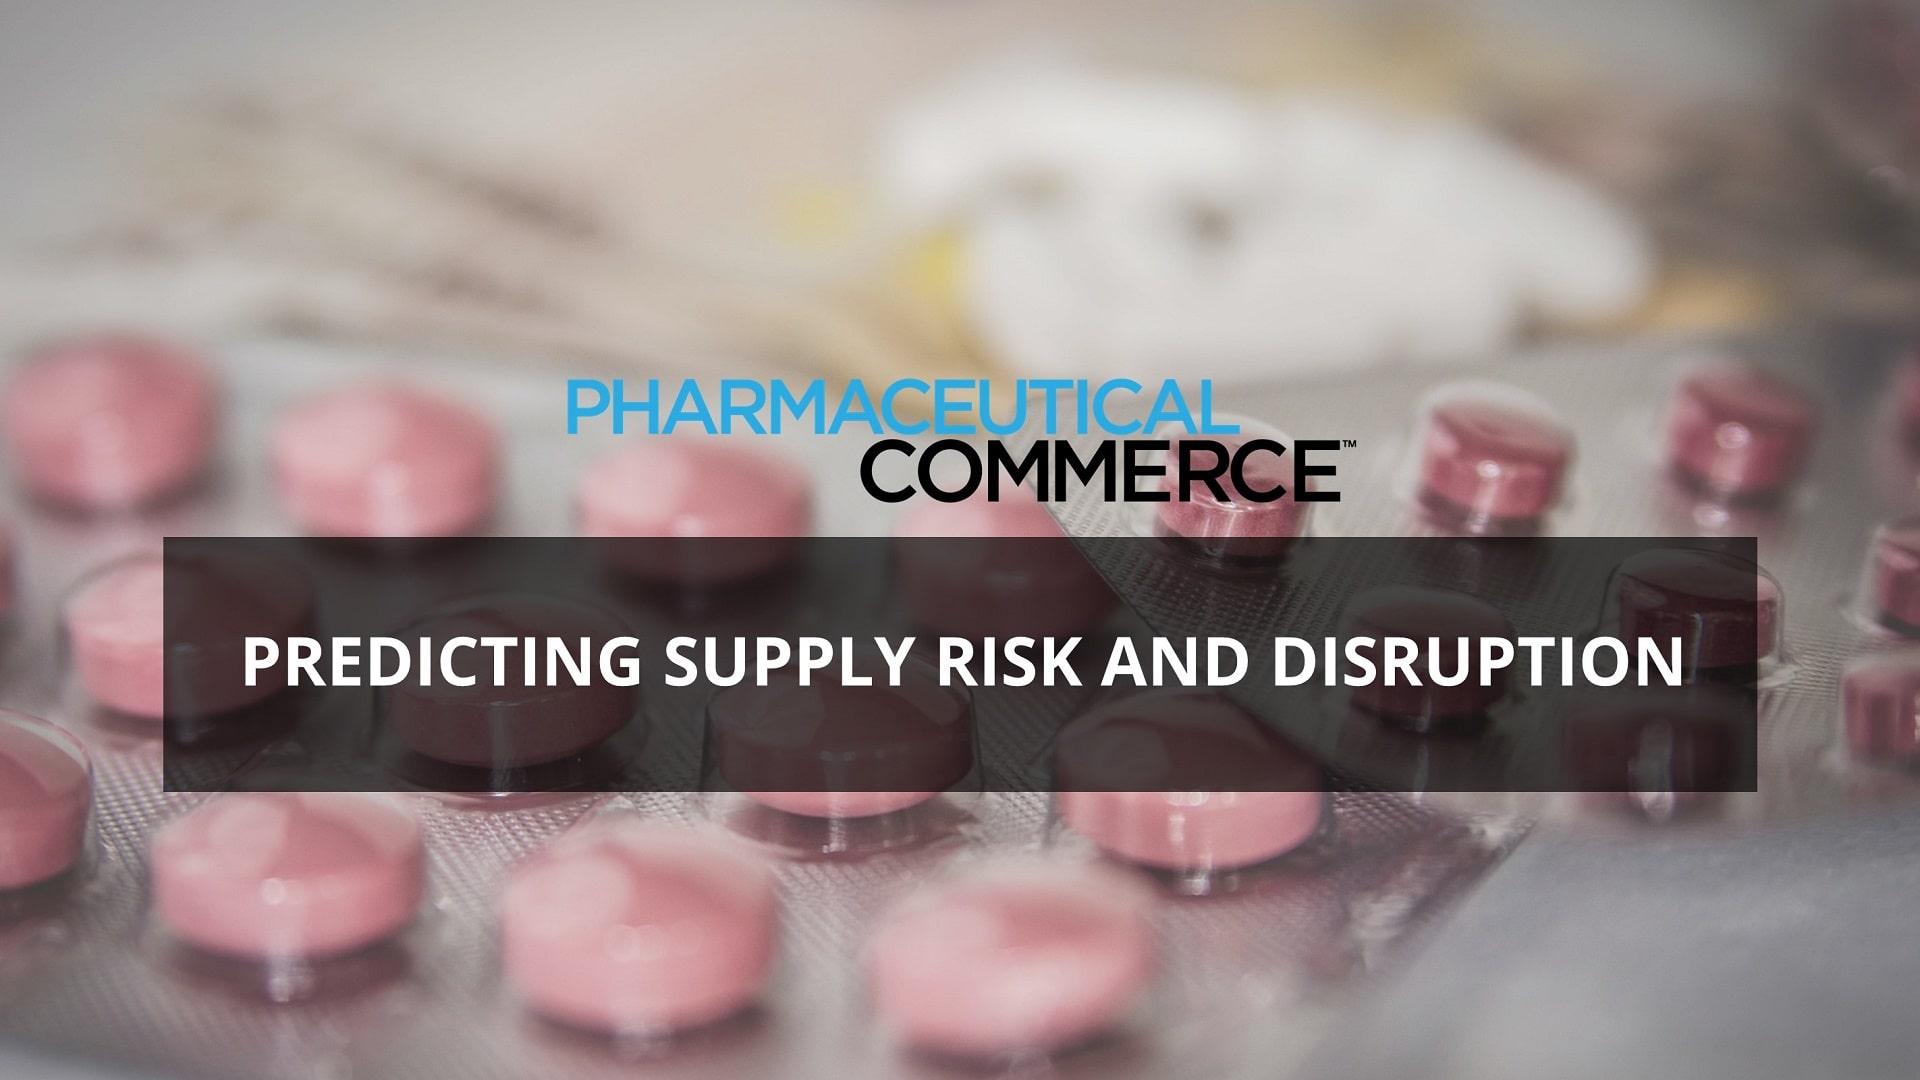 Pharma Commerce - Supply Chain Risk